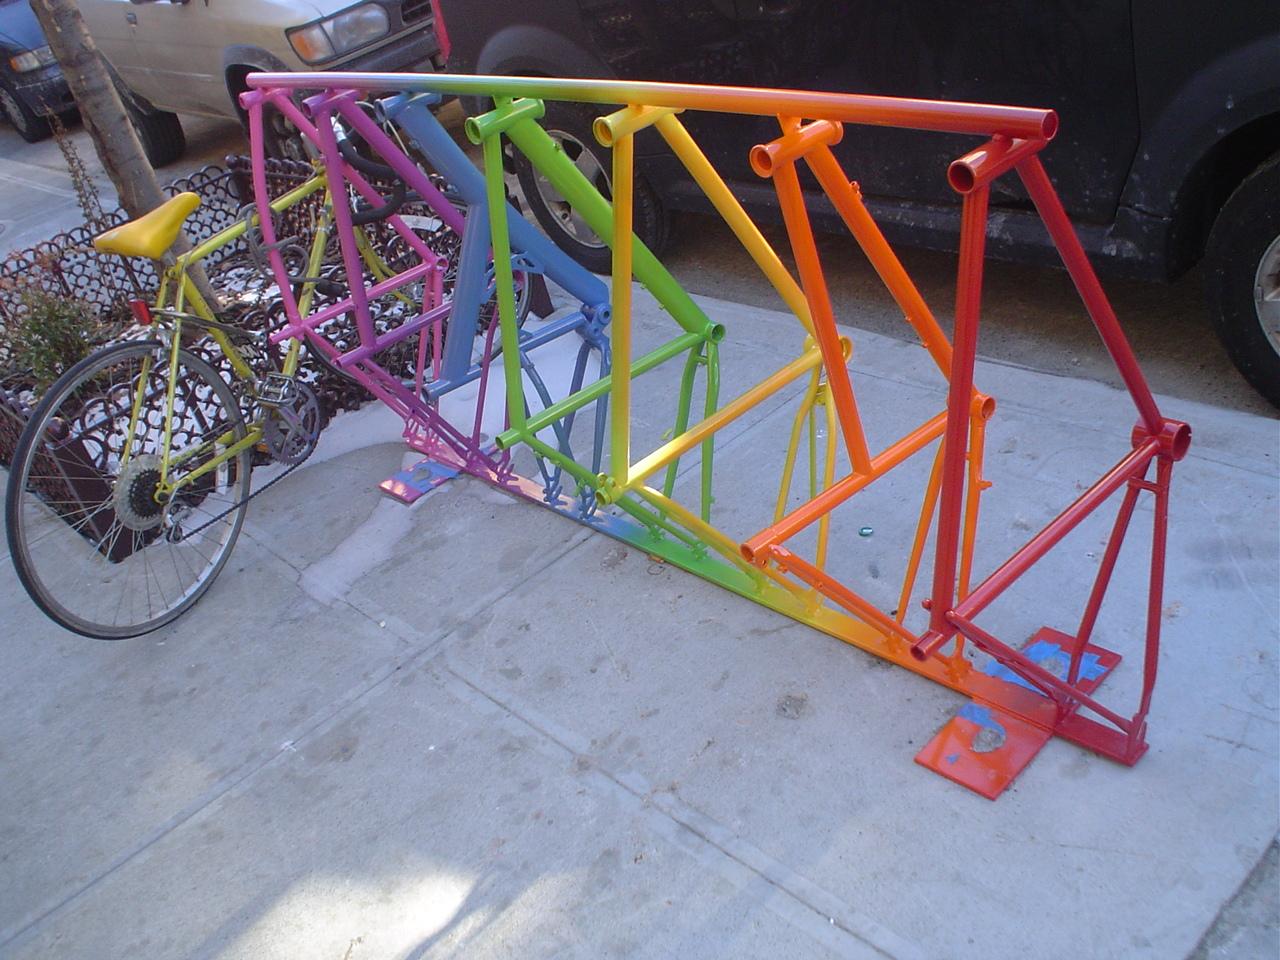 The Coolest Bike Racks Ever Made